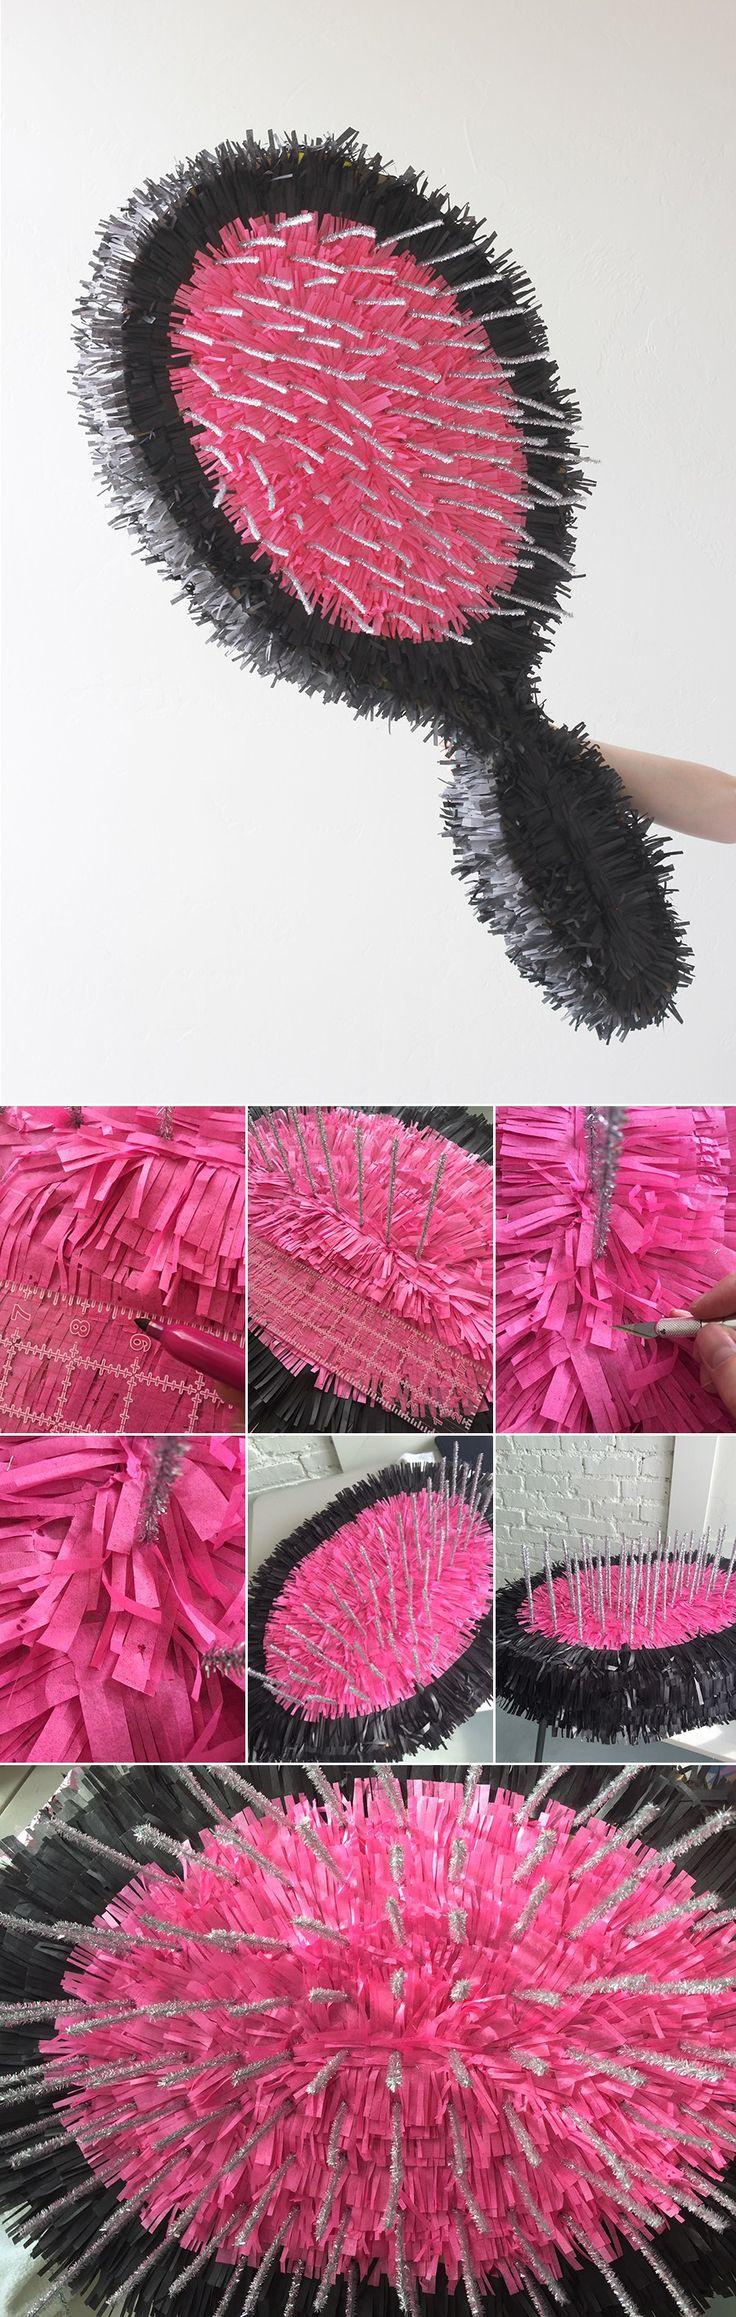 hair brush pinata instructions